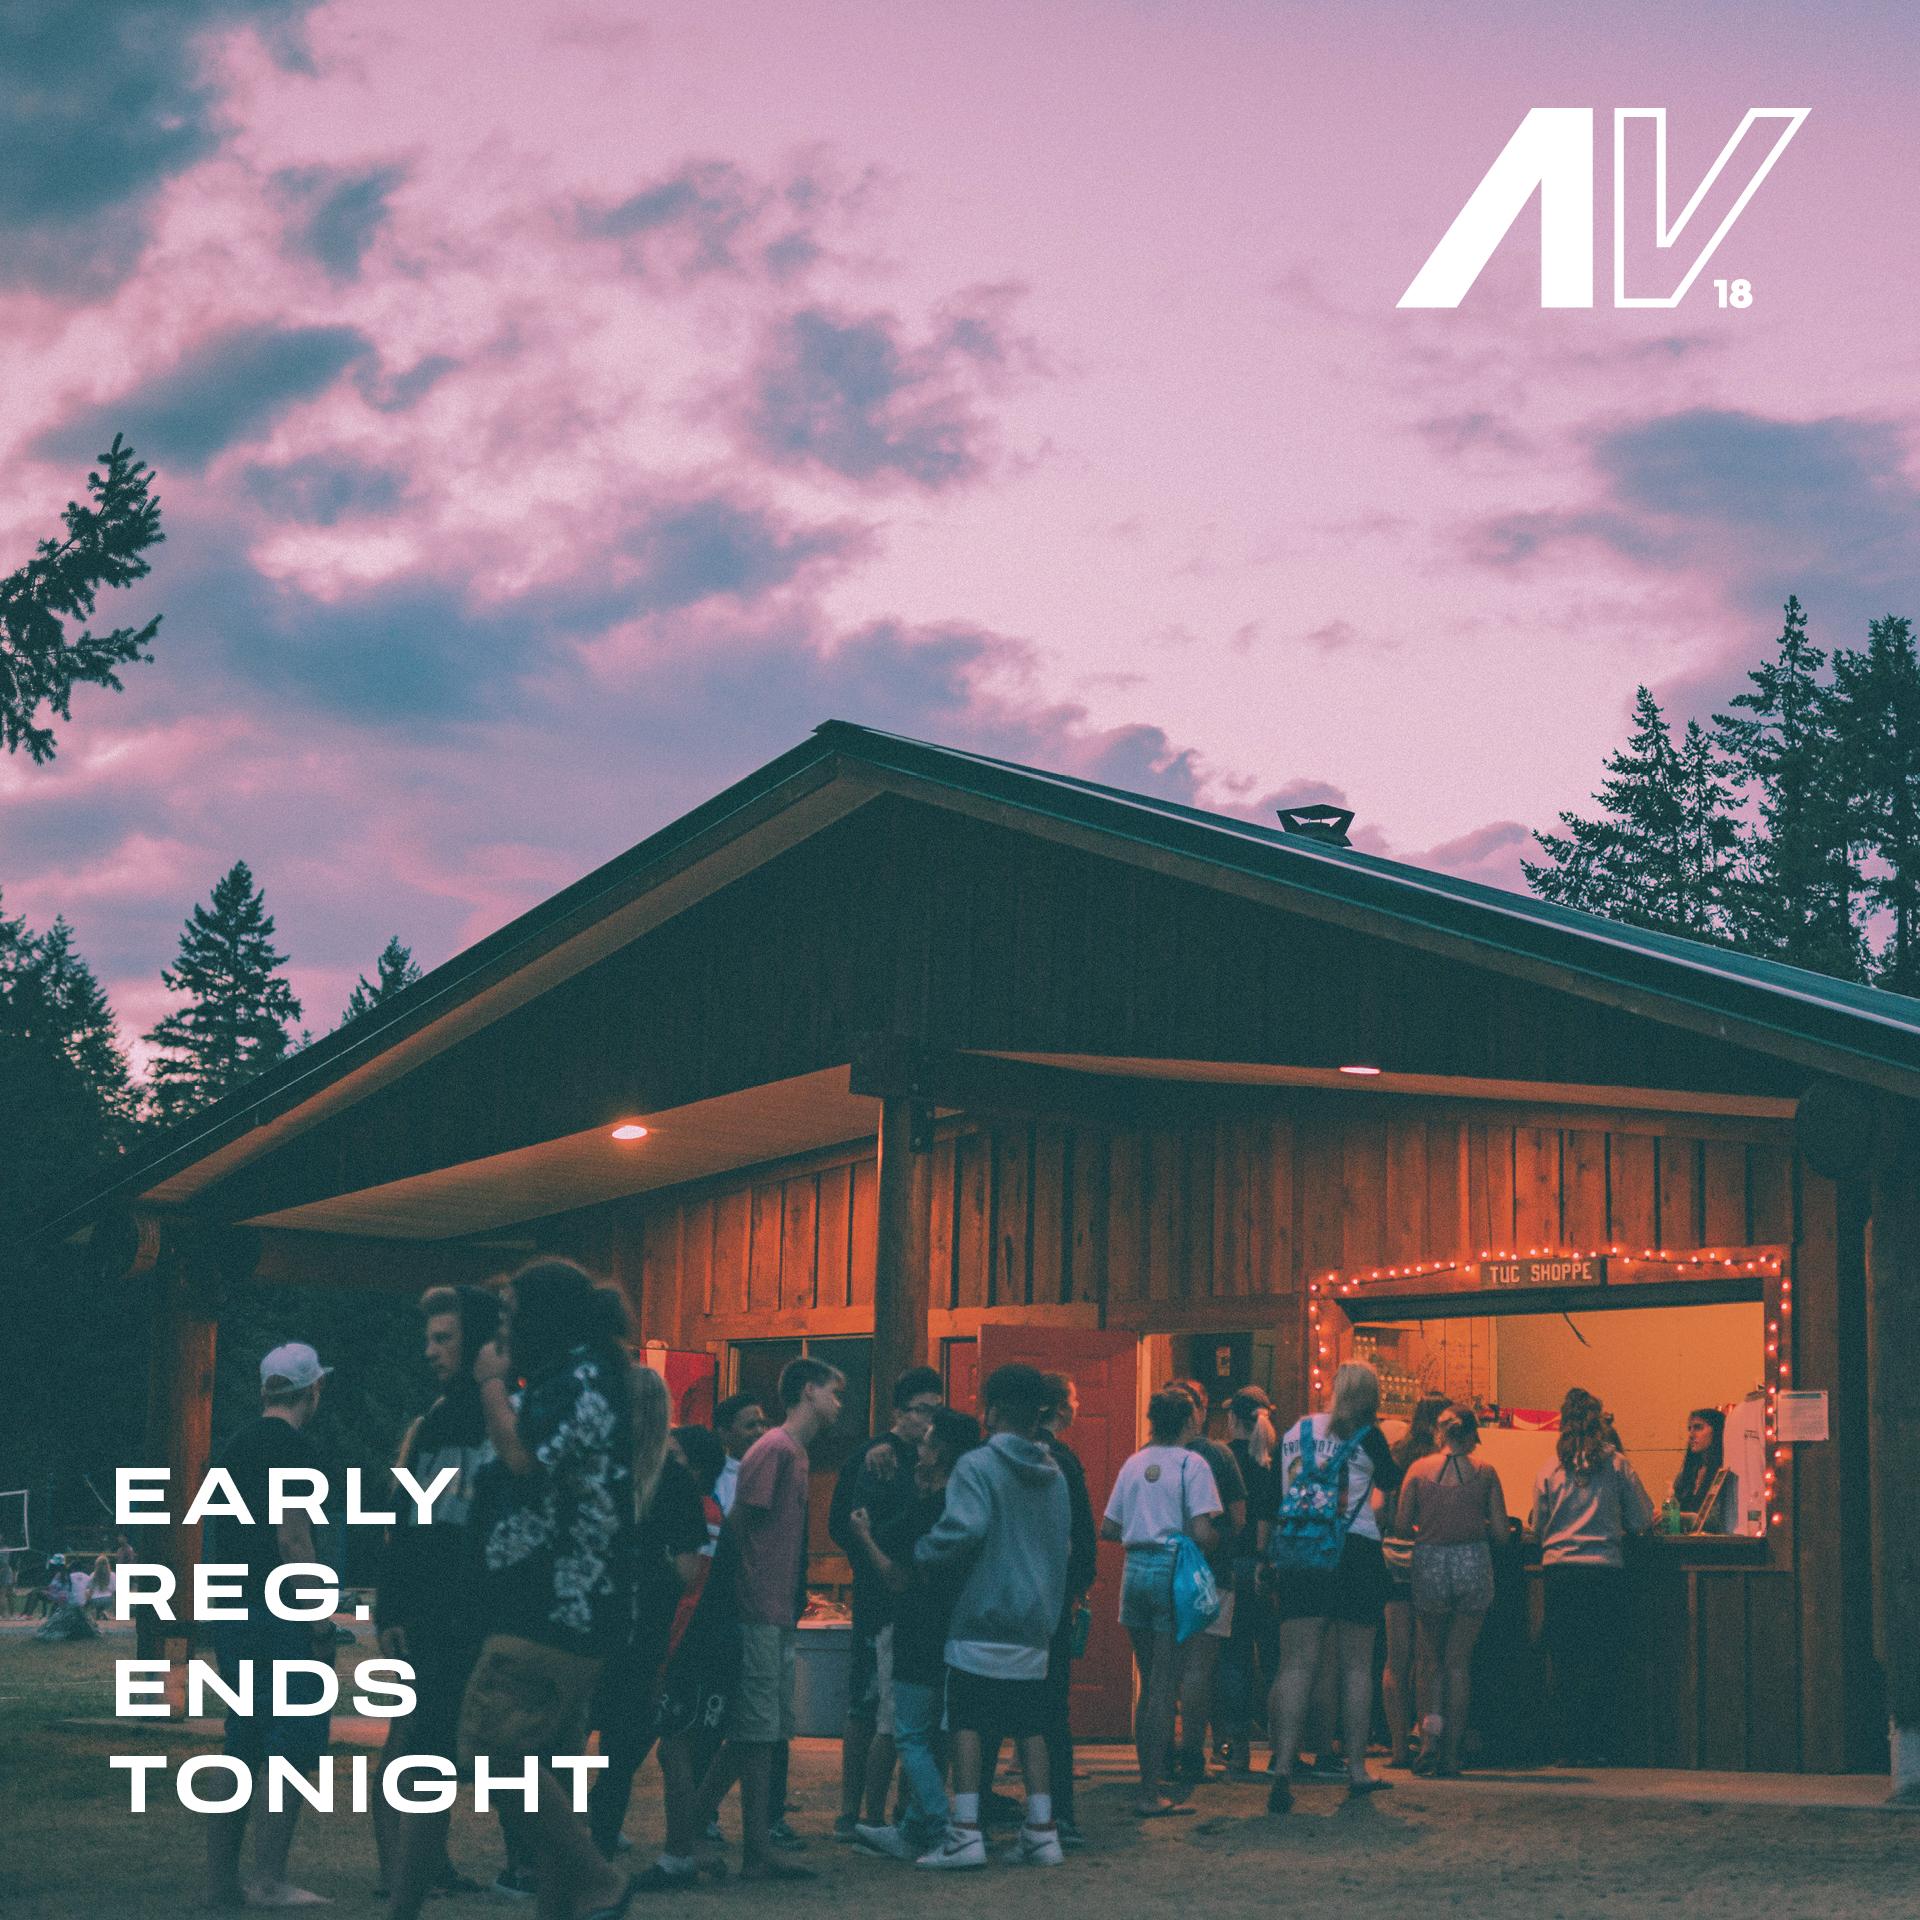 Rev Camp 2018 Early Reg Ends Tonight.jpg